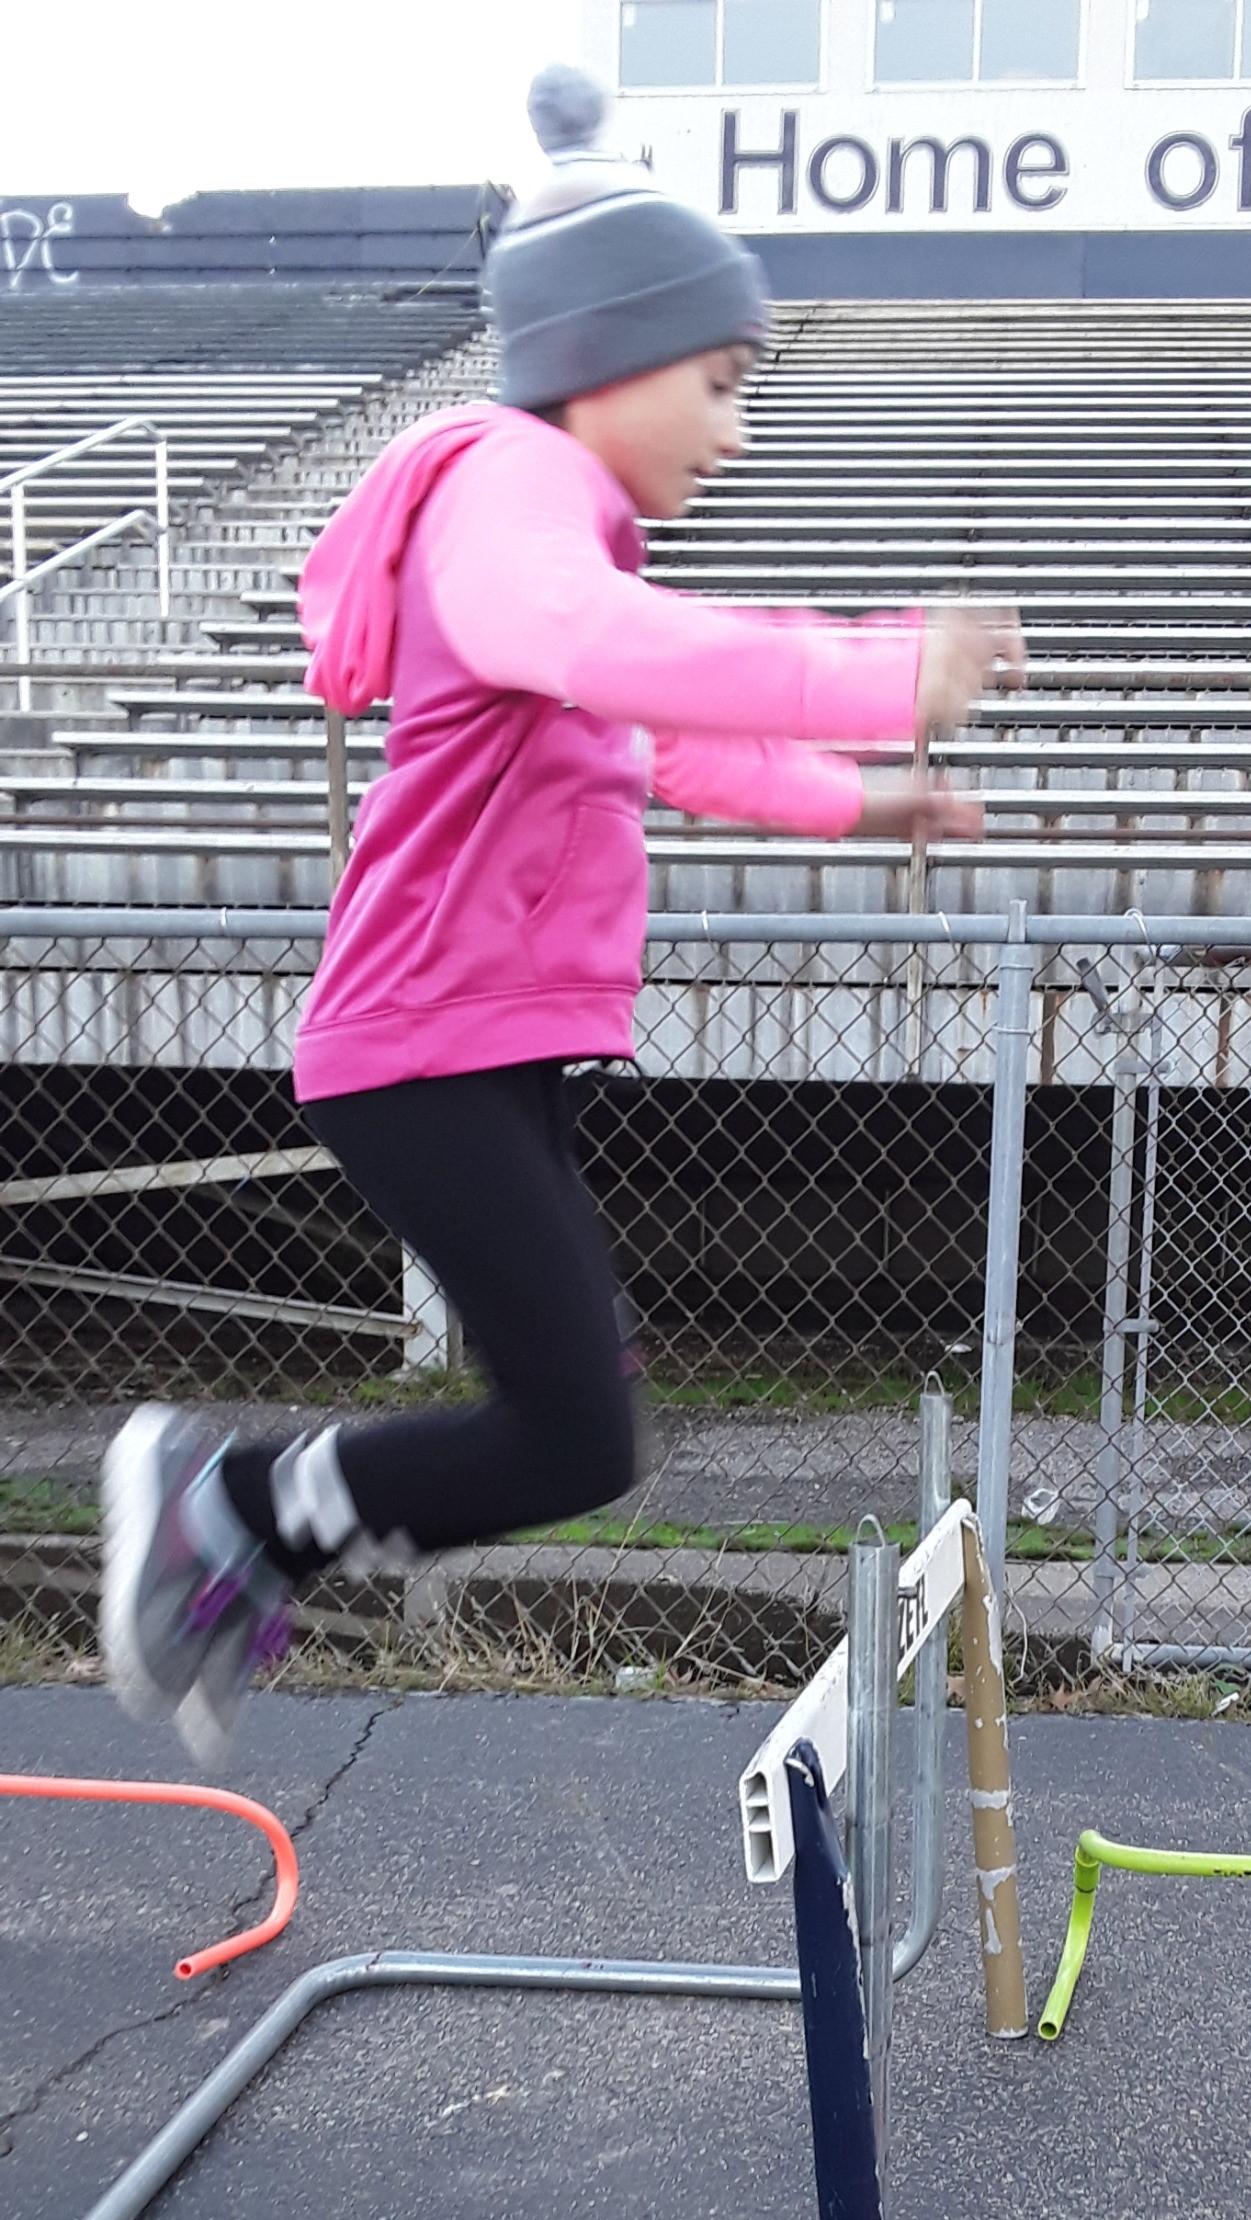 Long, Triple or High Jump training